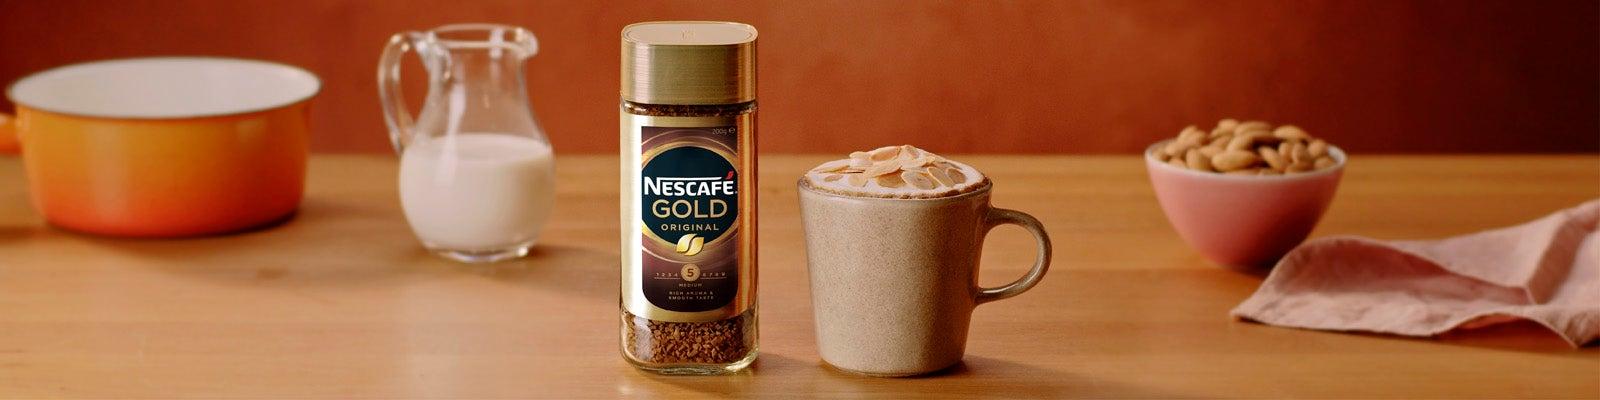 Roasted Almond Coffee